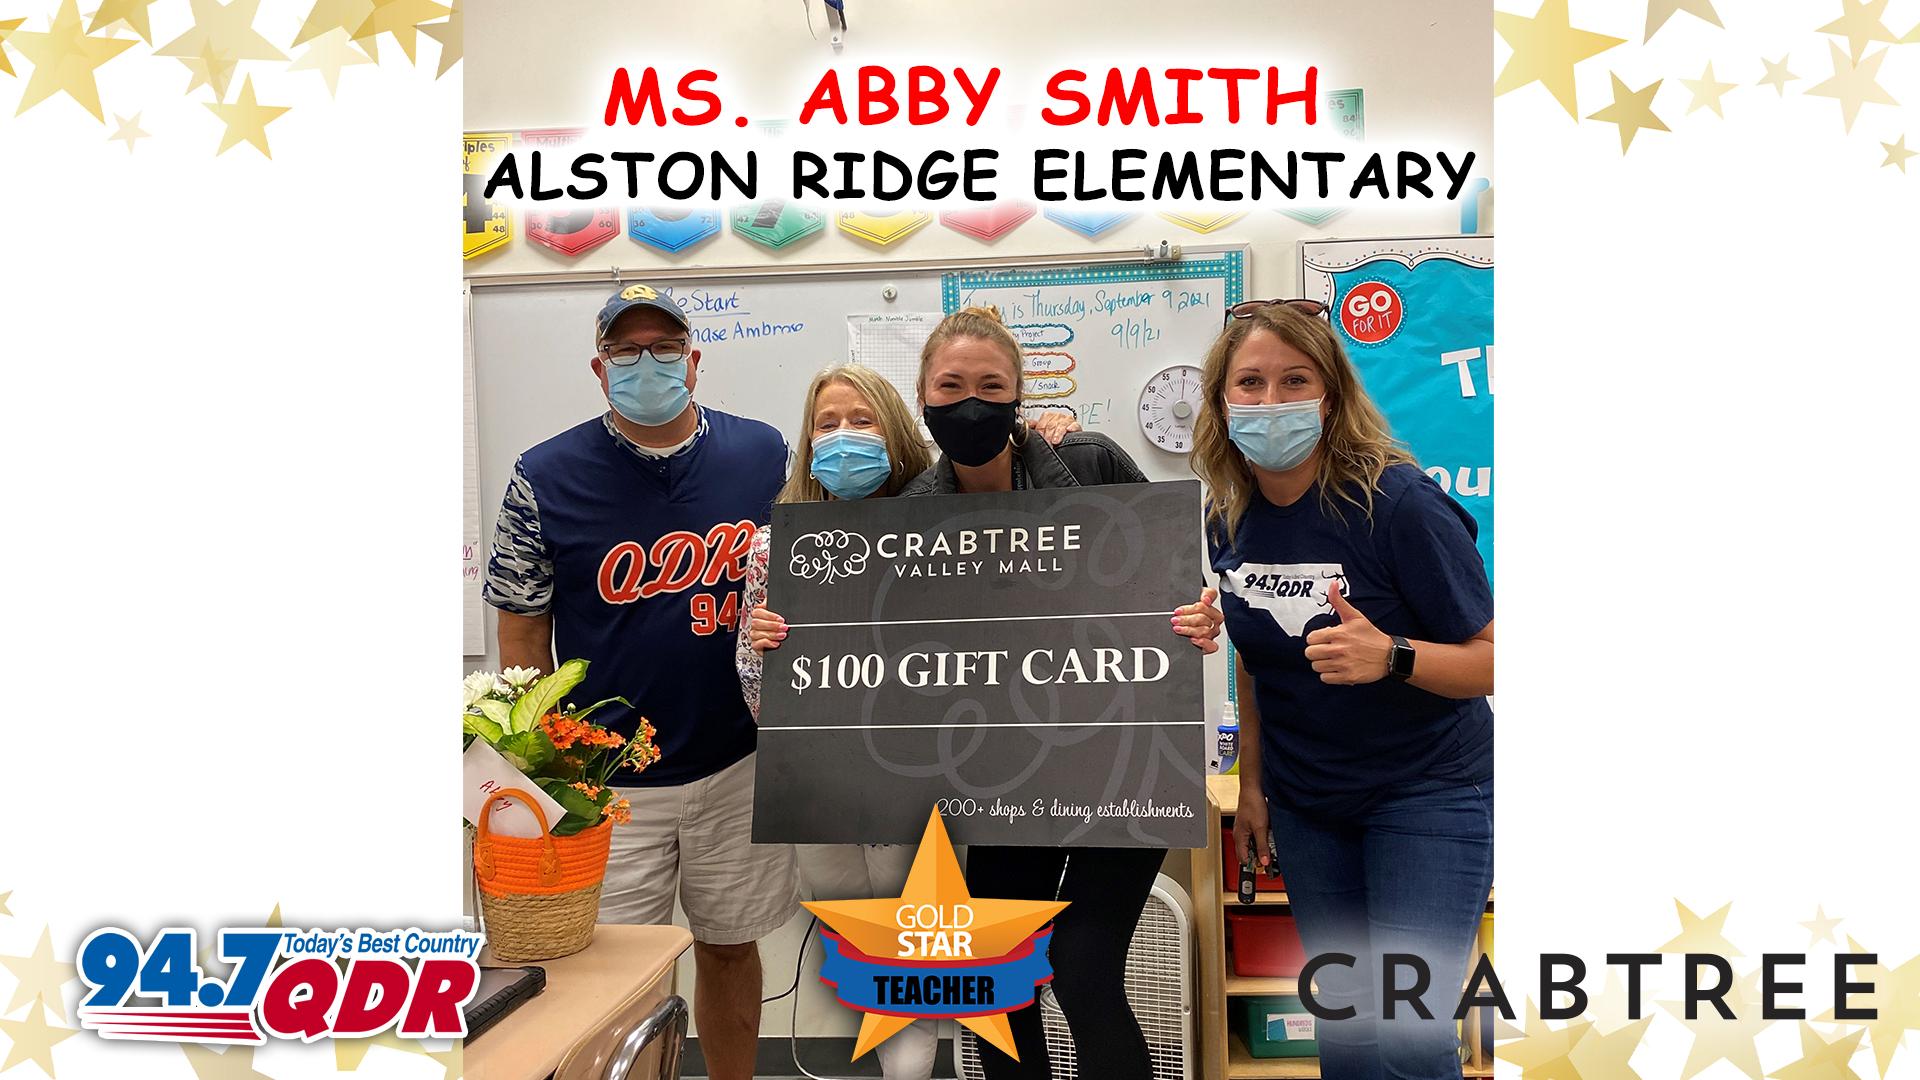 Gold Star Teacher September 2021 – Ms. Abby Smith!